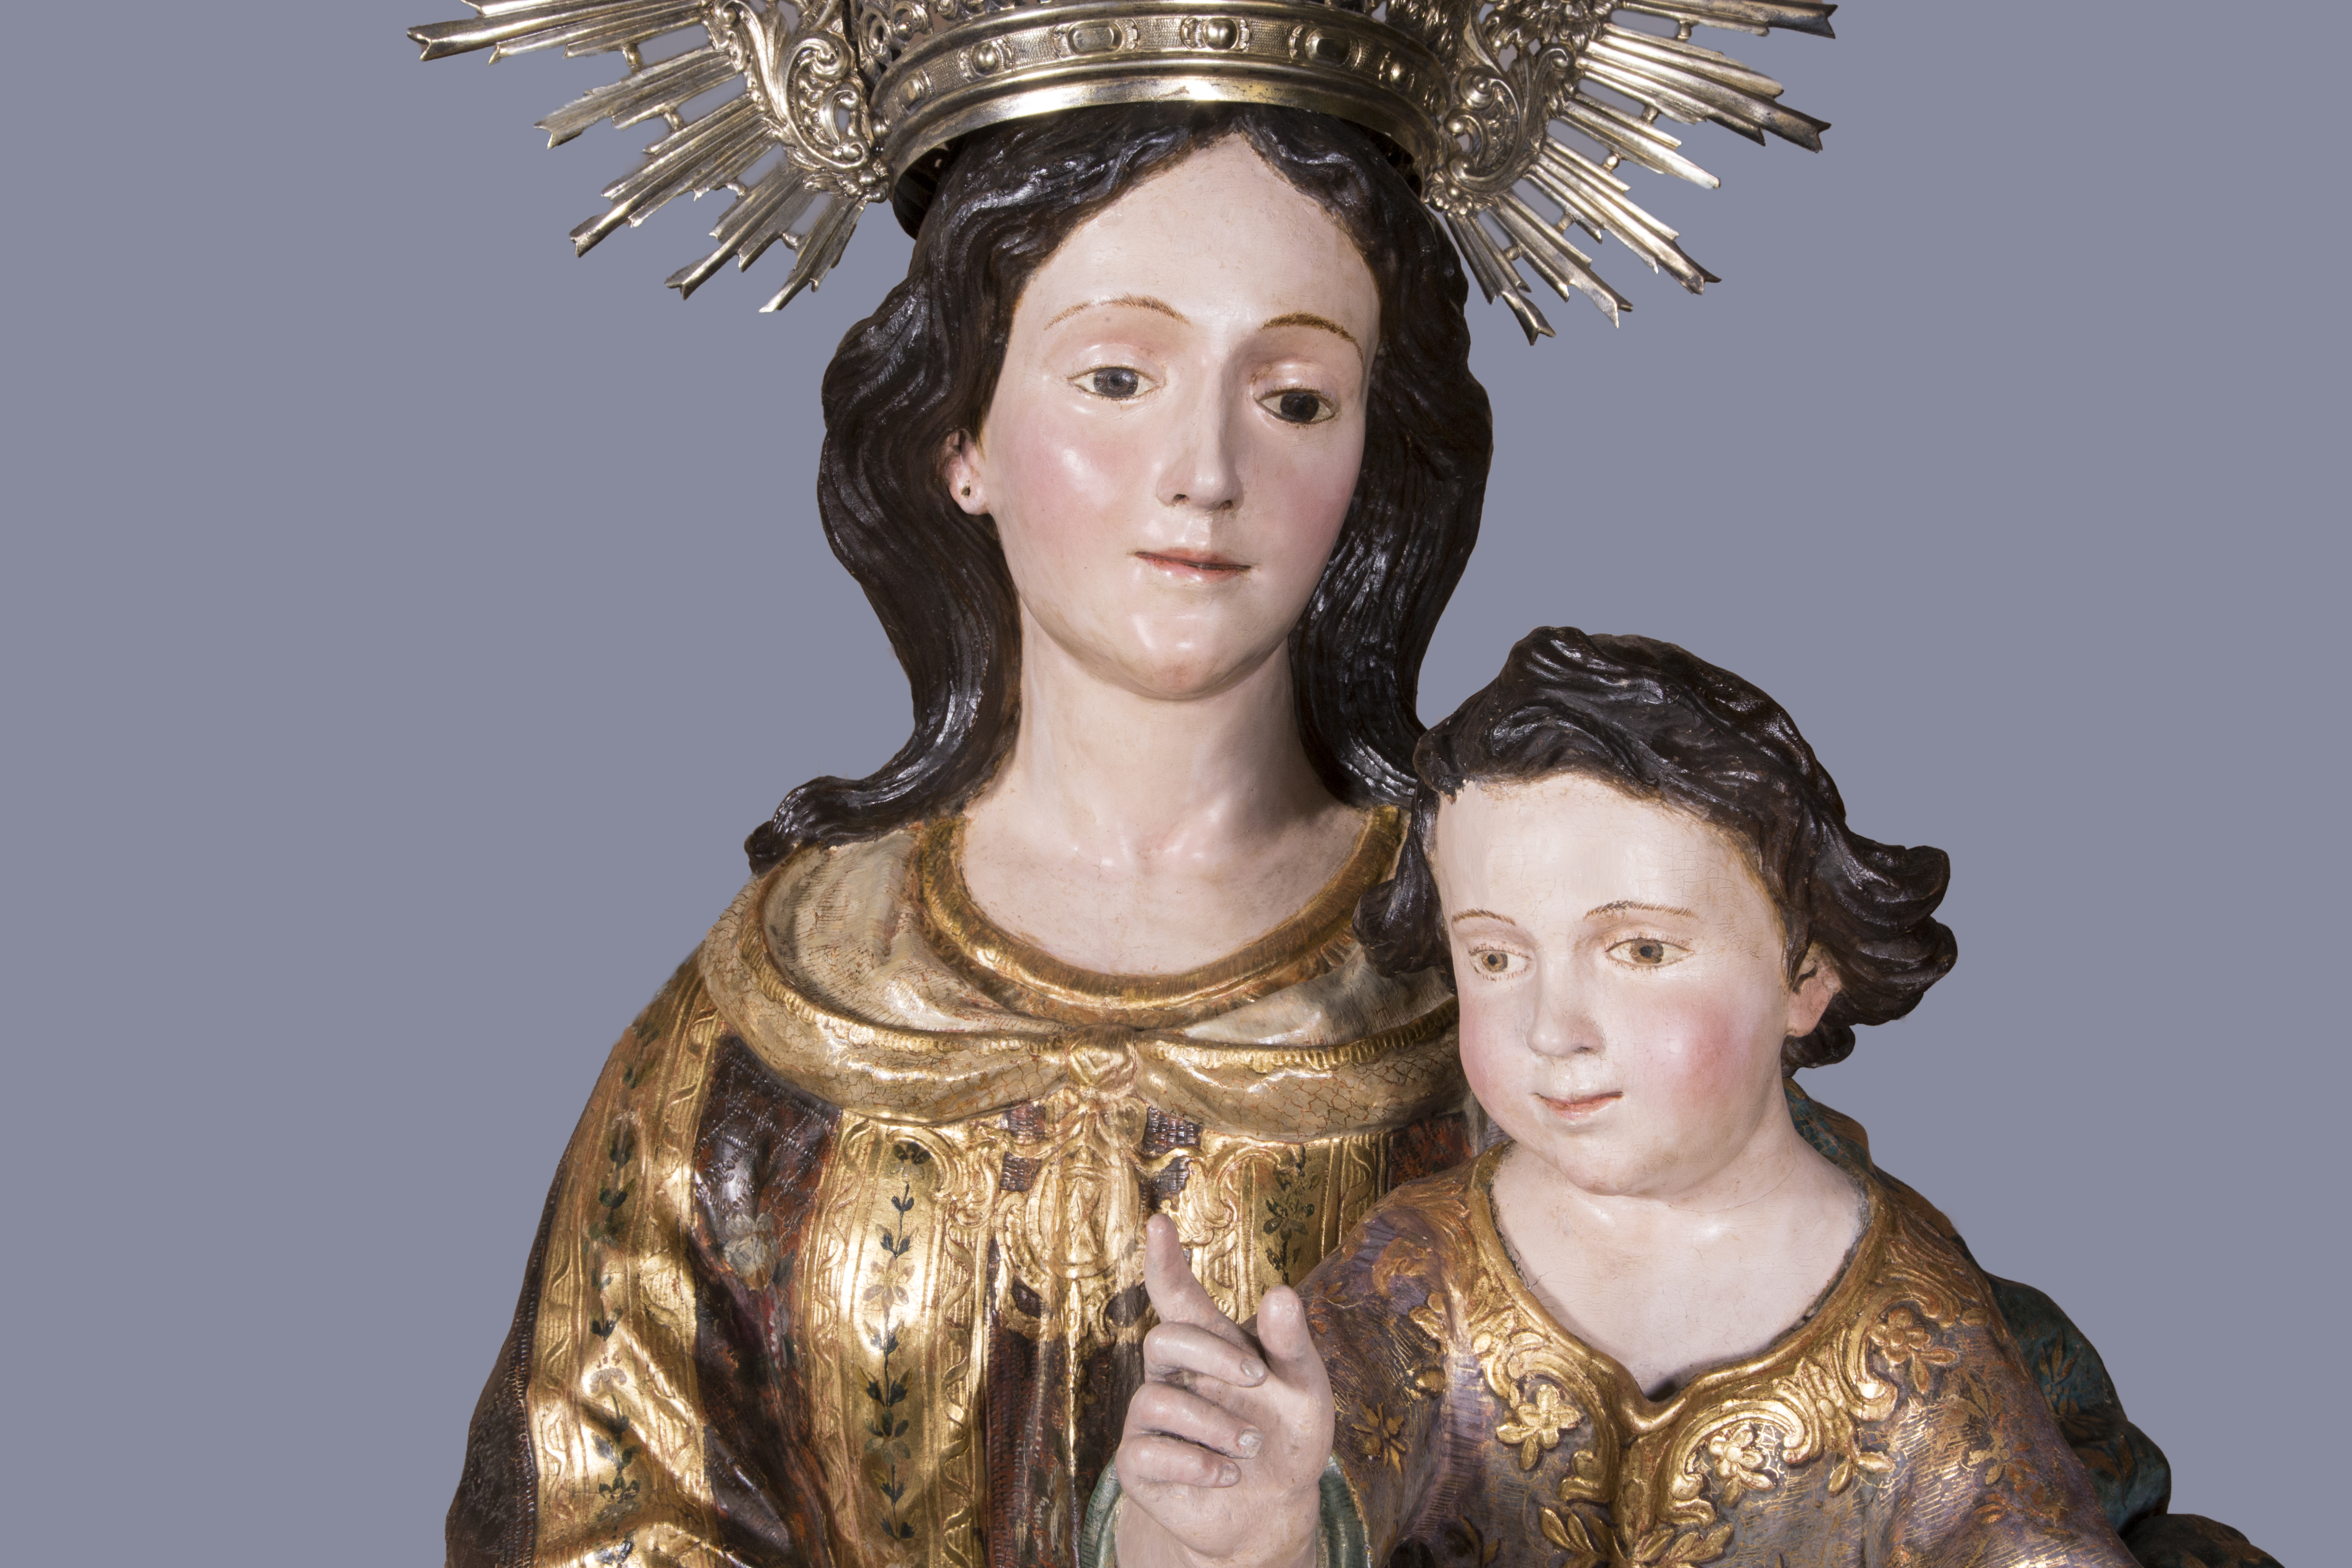 FINALATRIBUTOS2.estauracion.v.rosario.sanjacinto.21